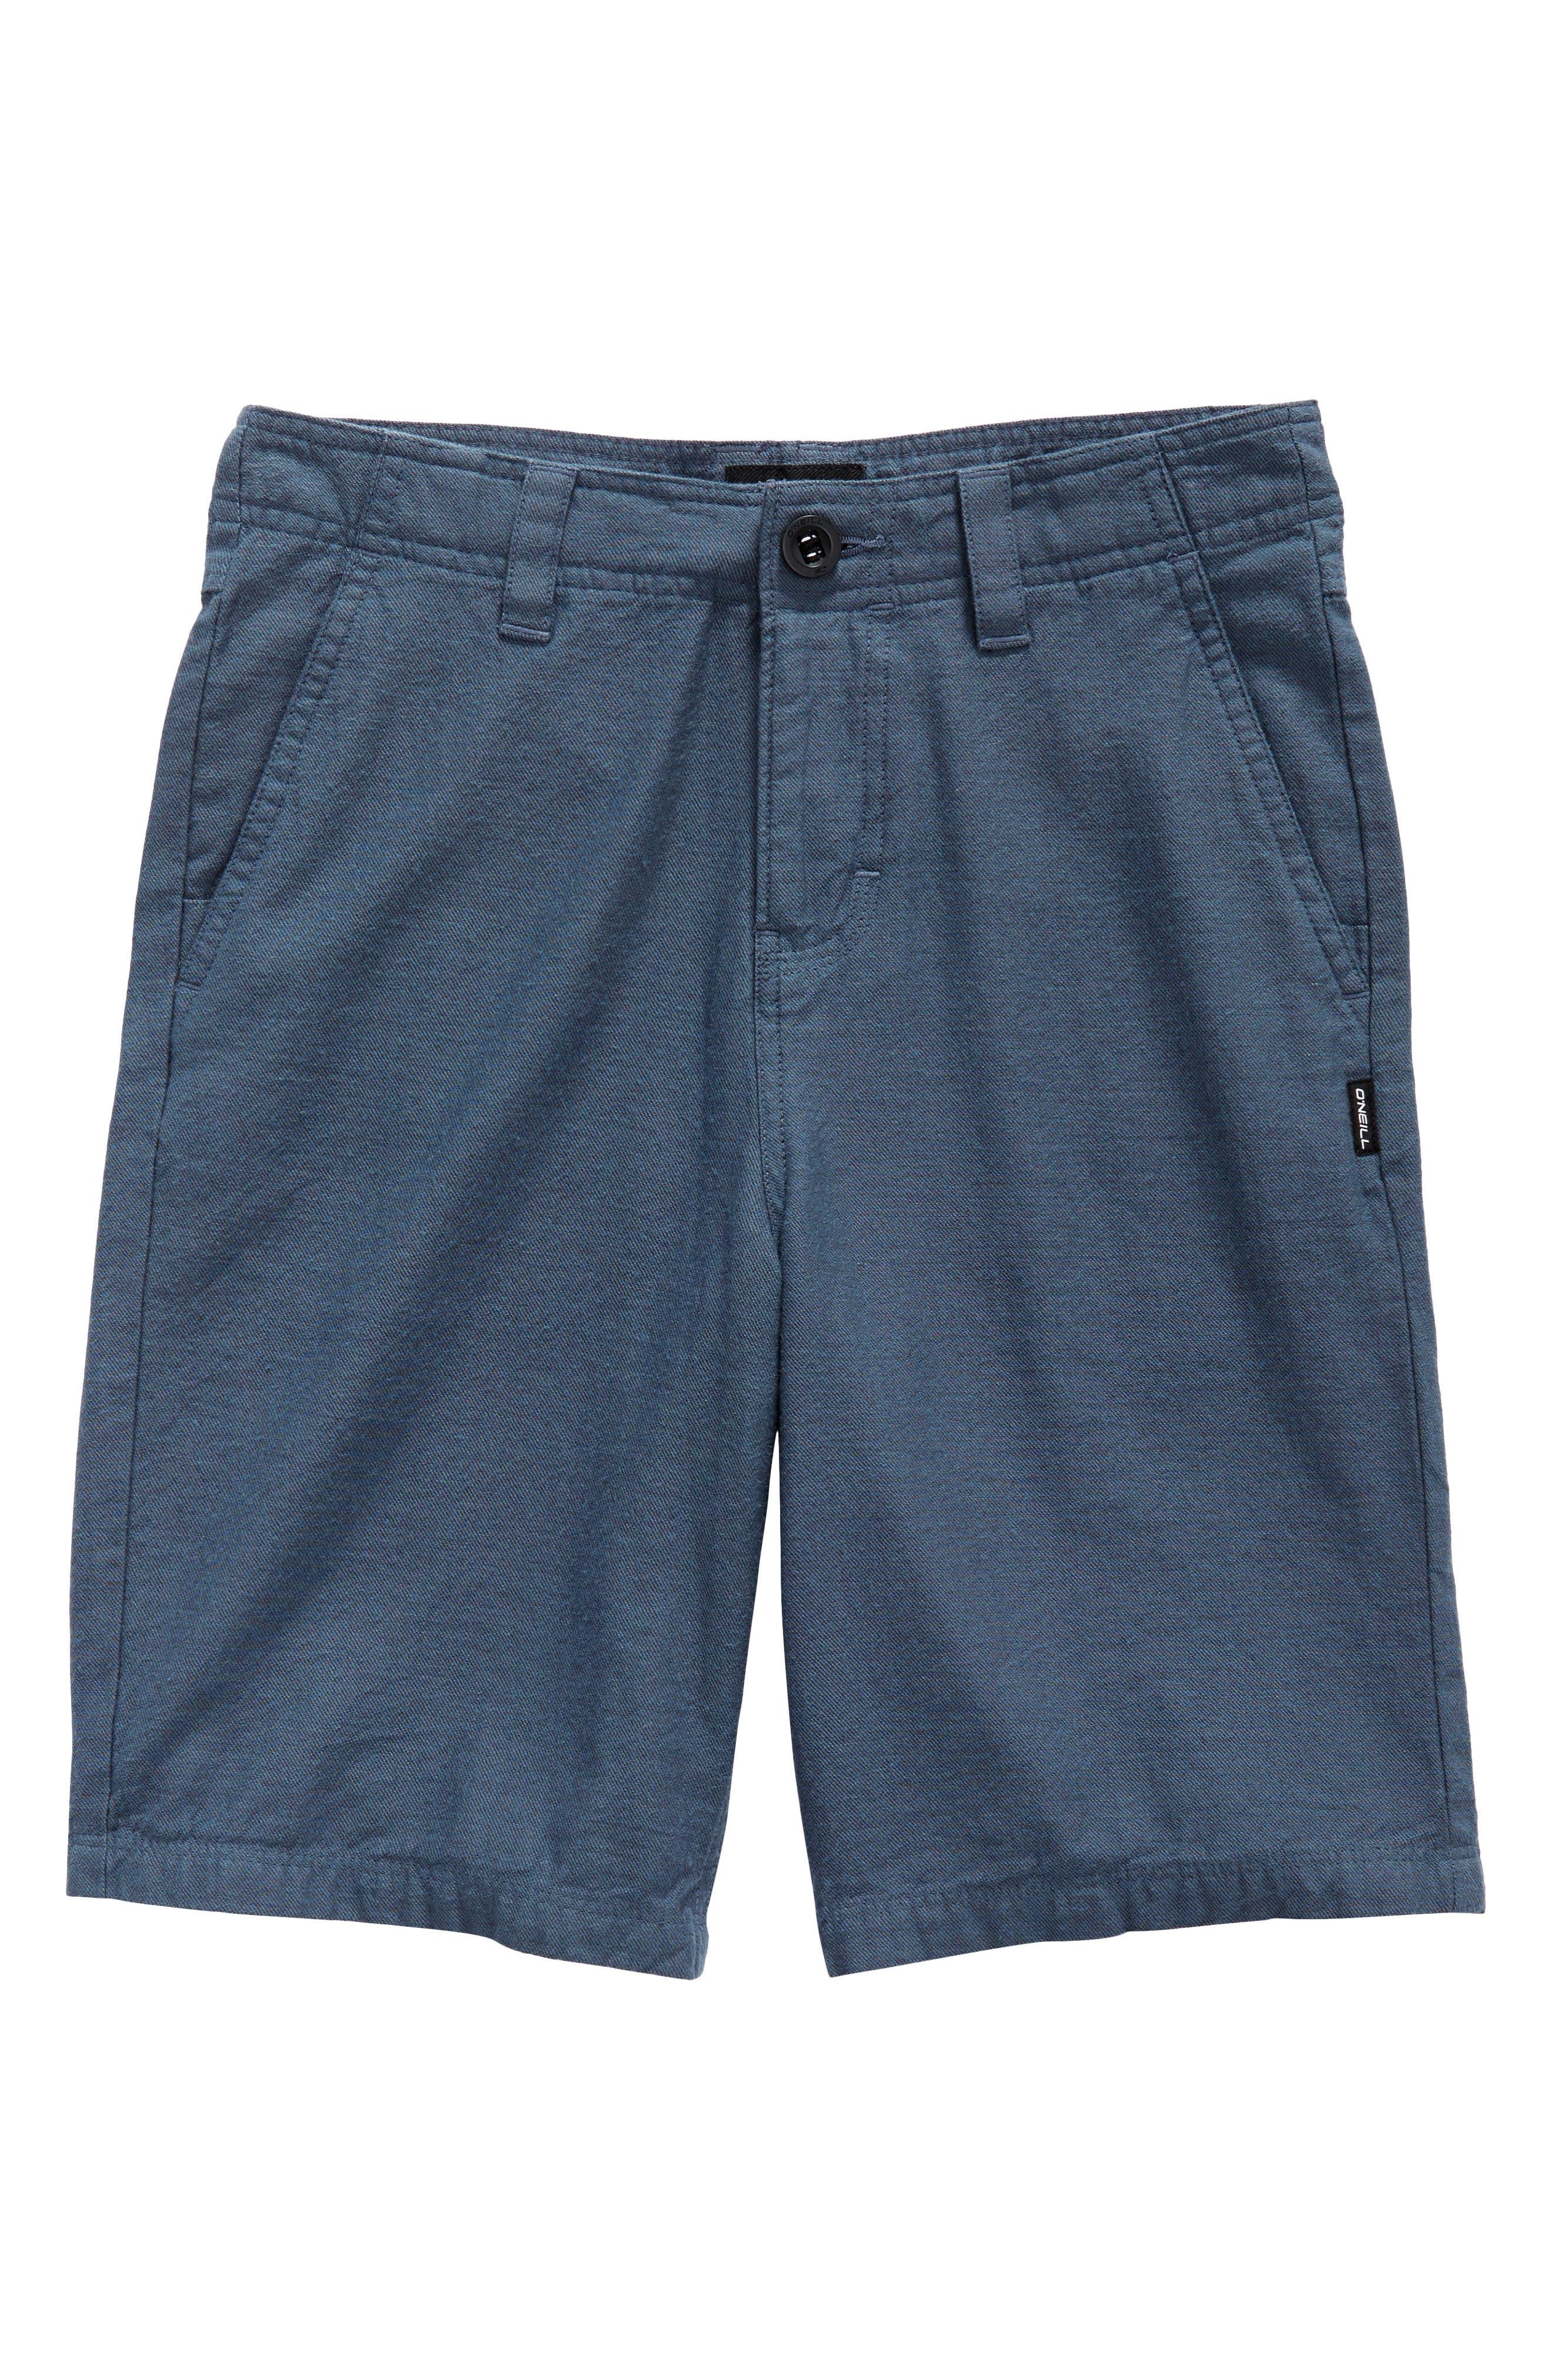 Alternate Image 1 Selected - O'Neill Scranton Chino Shorts (Big Boys)